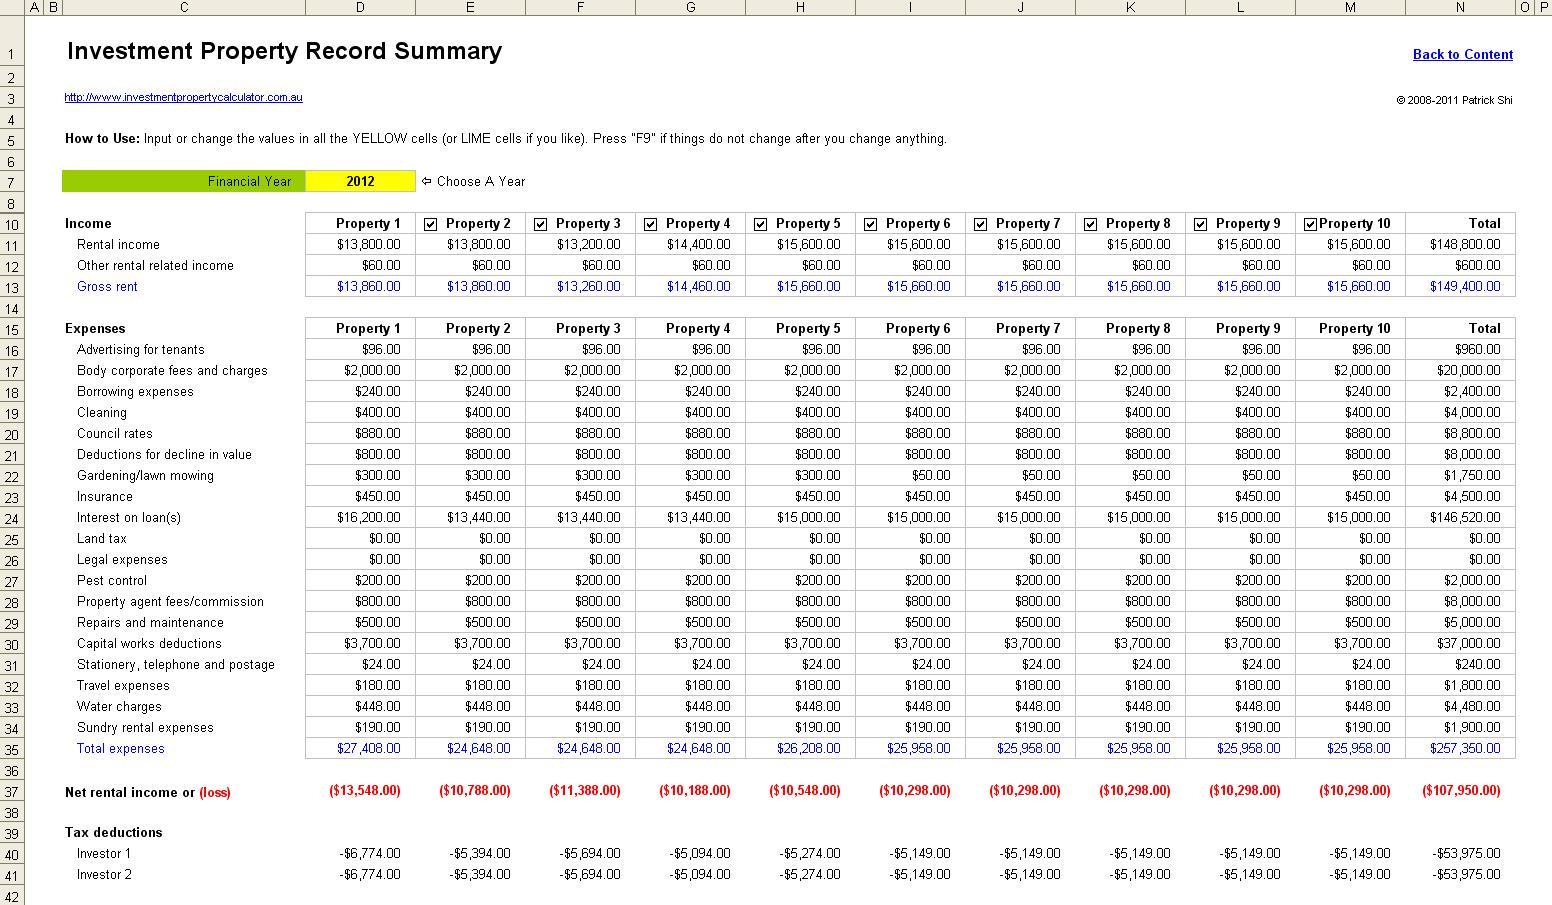 Property Management Spreadsheet Template Free With Property Management Spreadsheet Free Download  Aljererlotgd